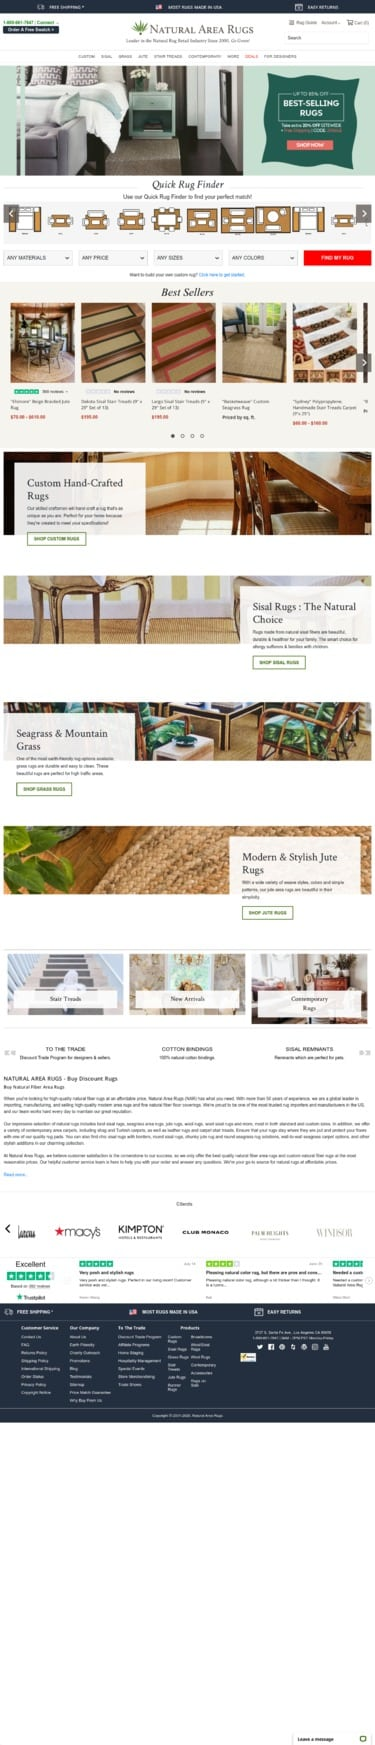 naturalarearugs.com Coupon